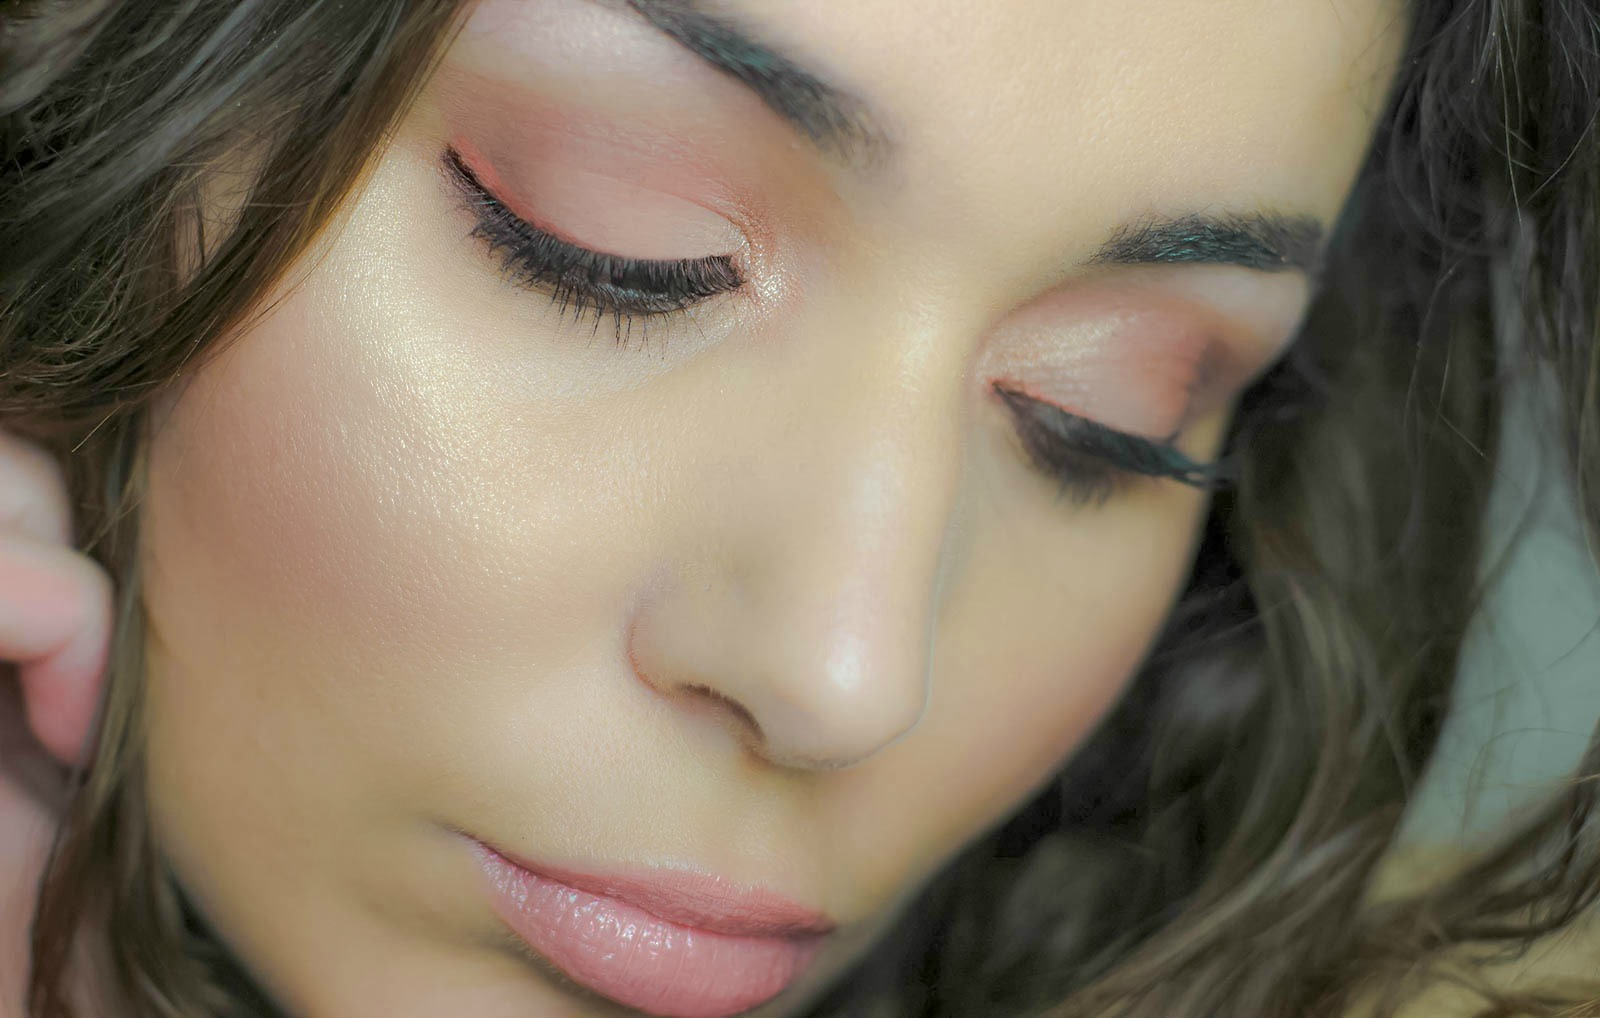 SWEET_PEACH_TOOFACED_makeup-3